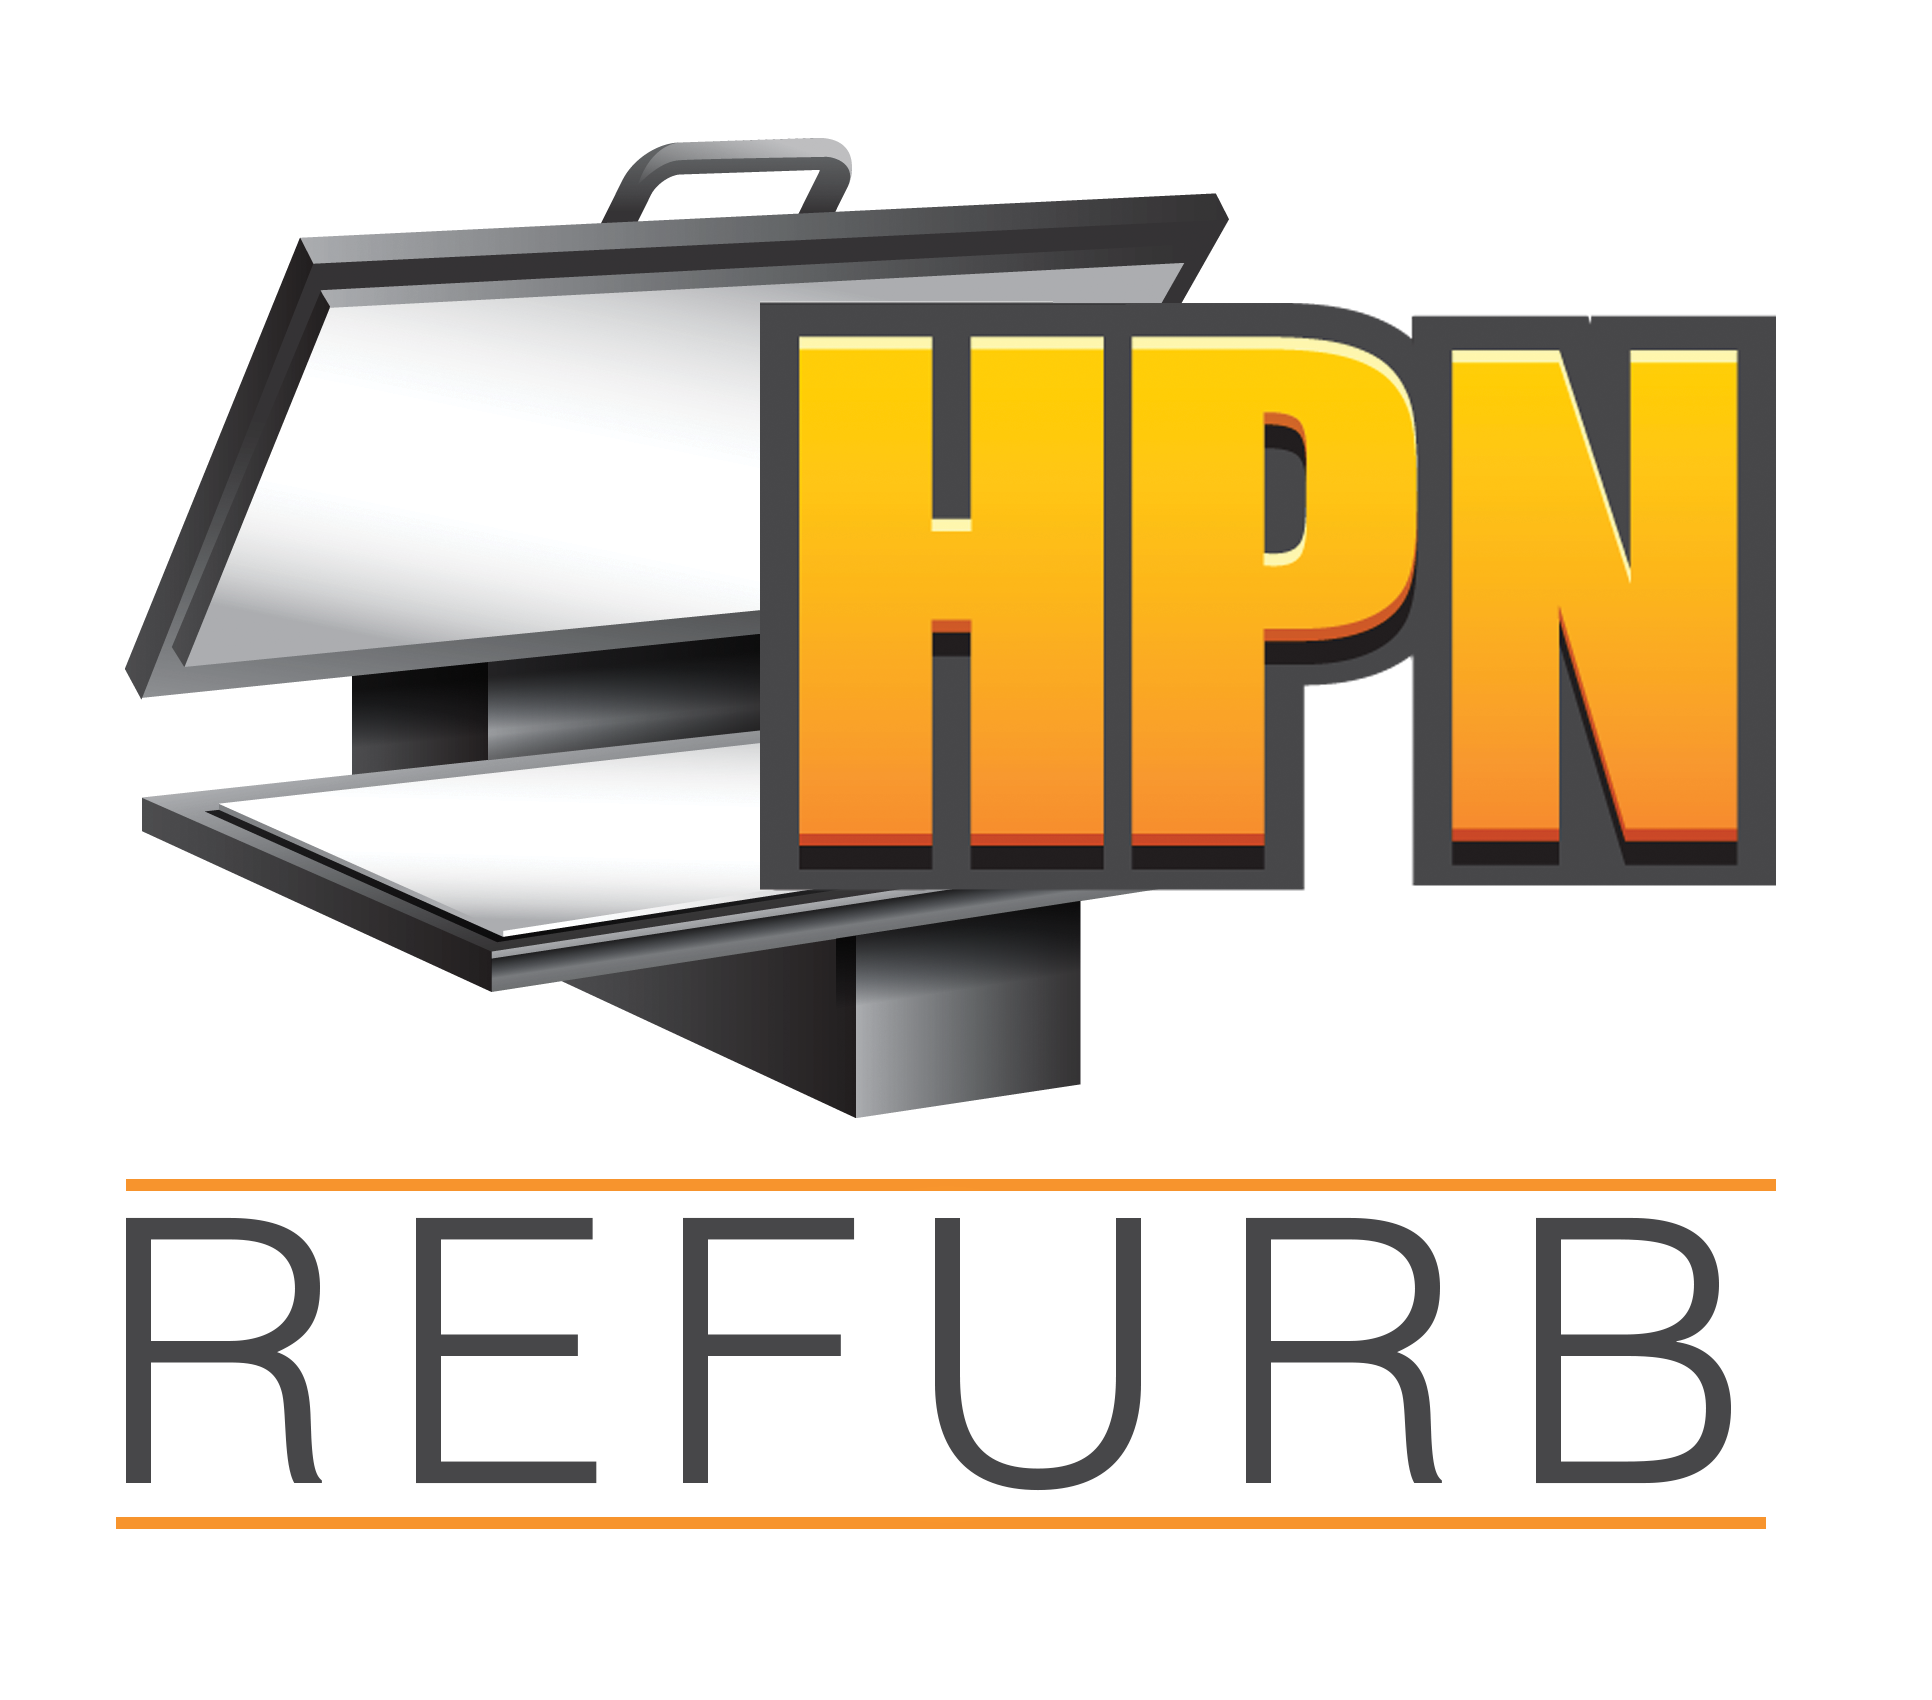 Heat clipart heat pressure. Refurbished hpn black series